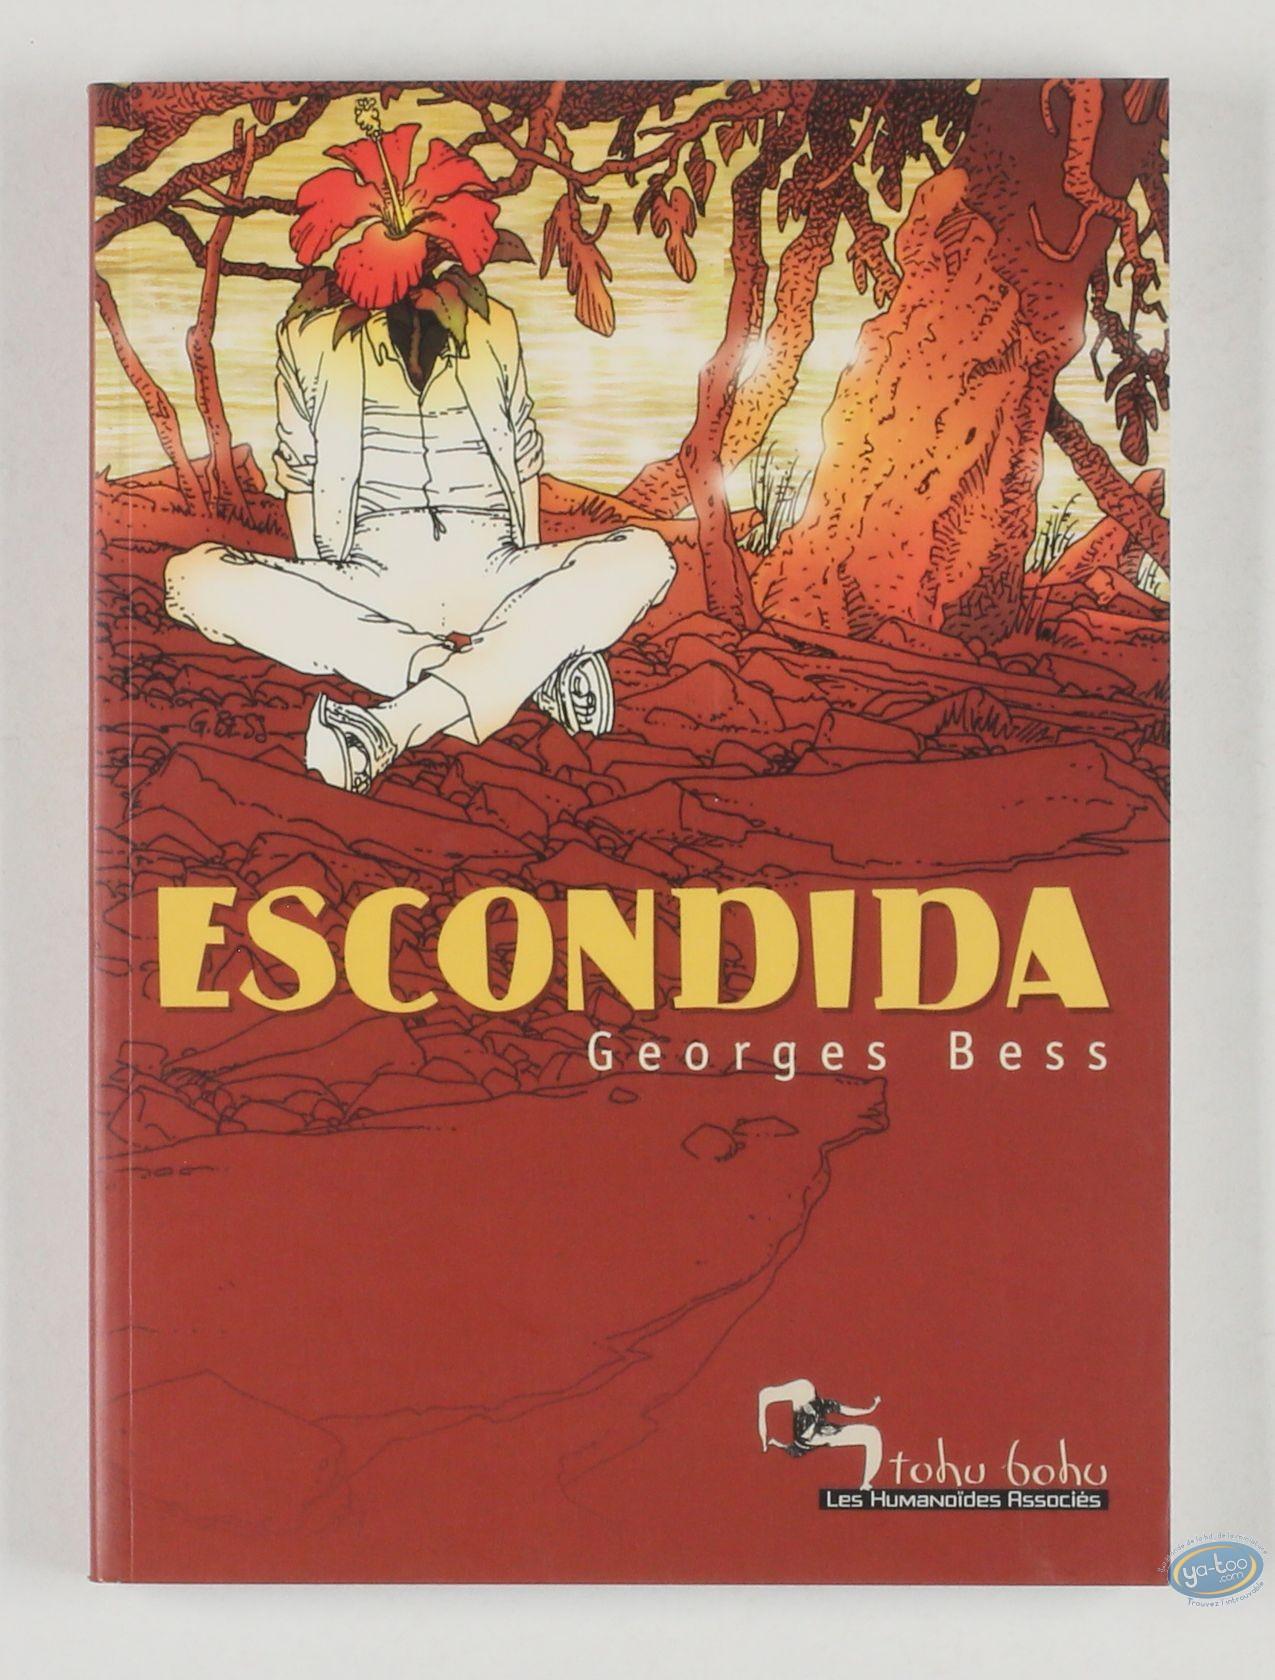 Reduced price European comic books, Tohu Bohu : Escondida - Collection Tohu Bohu